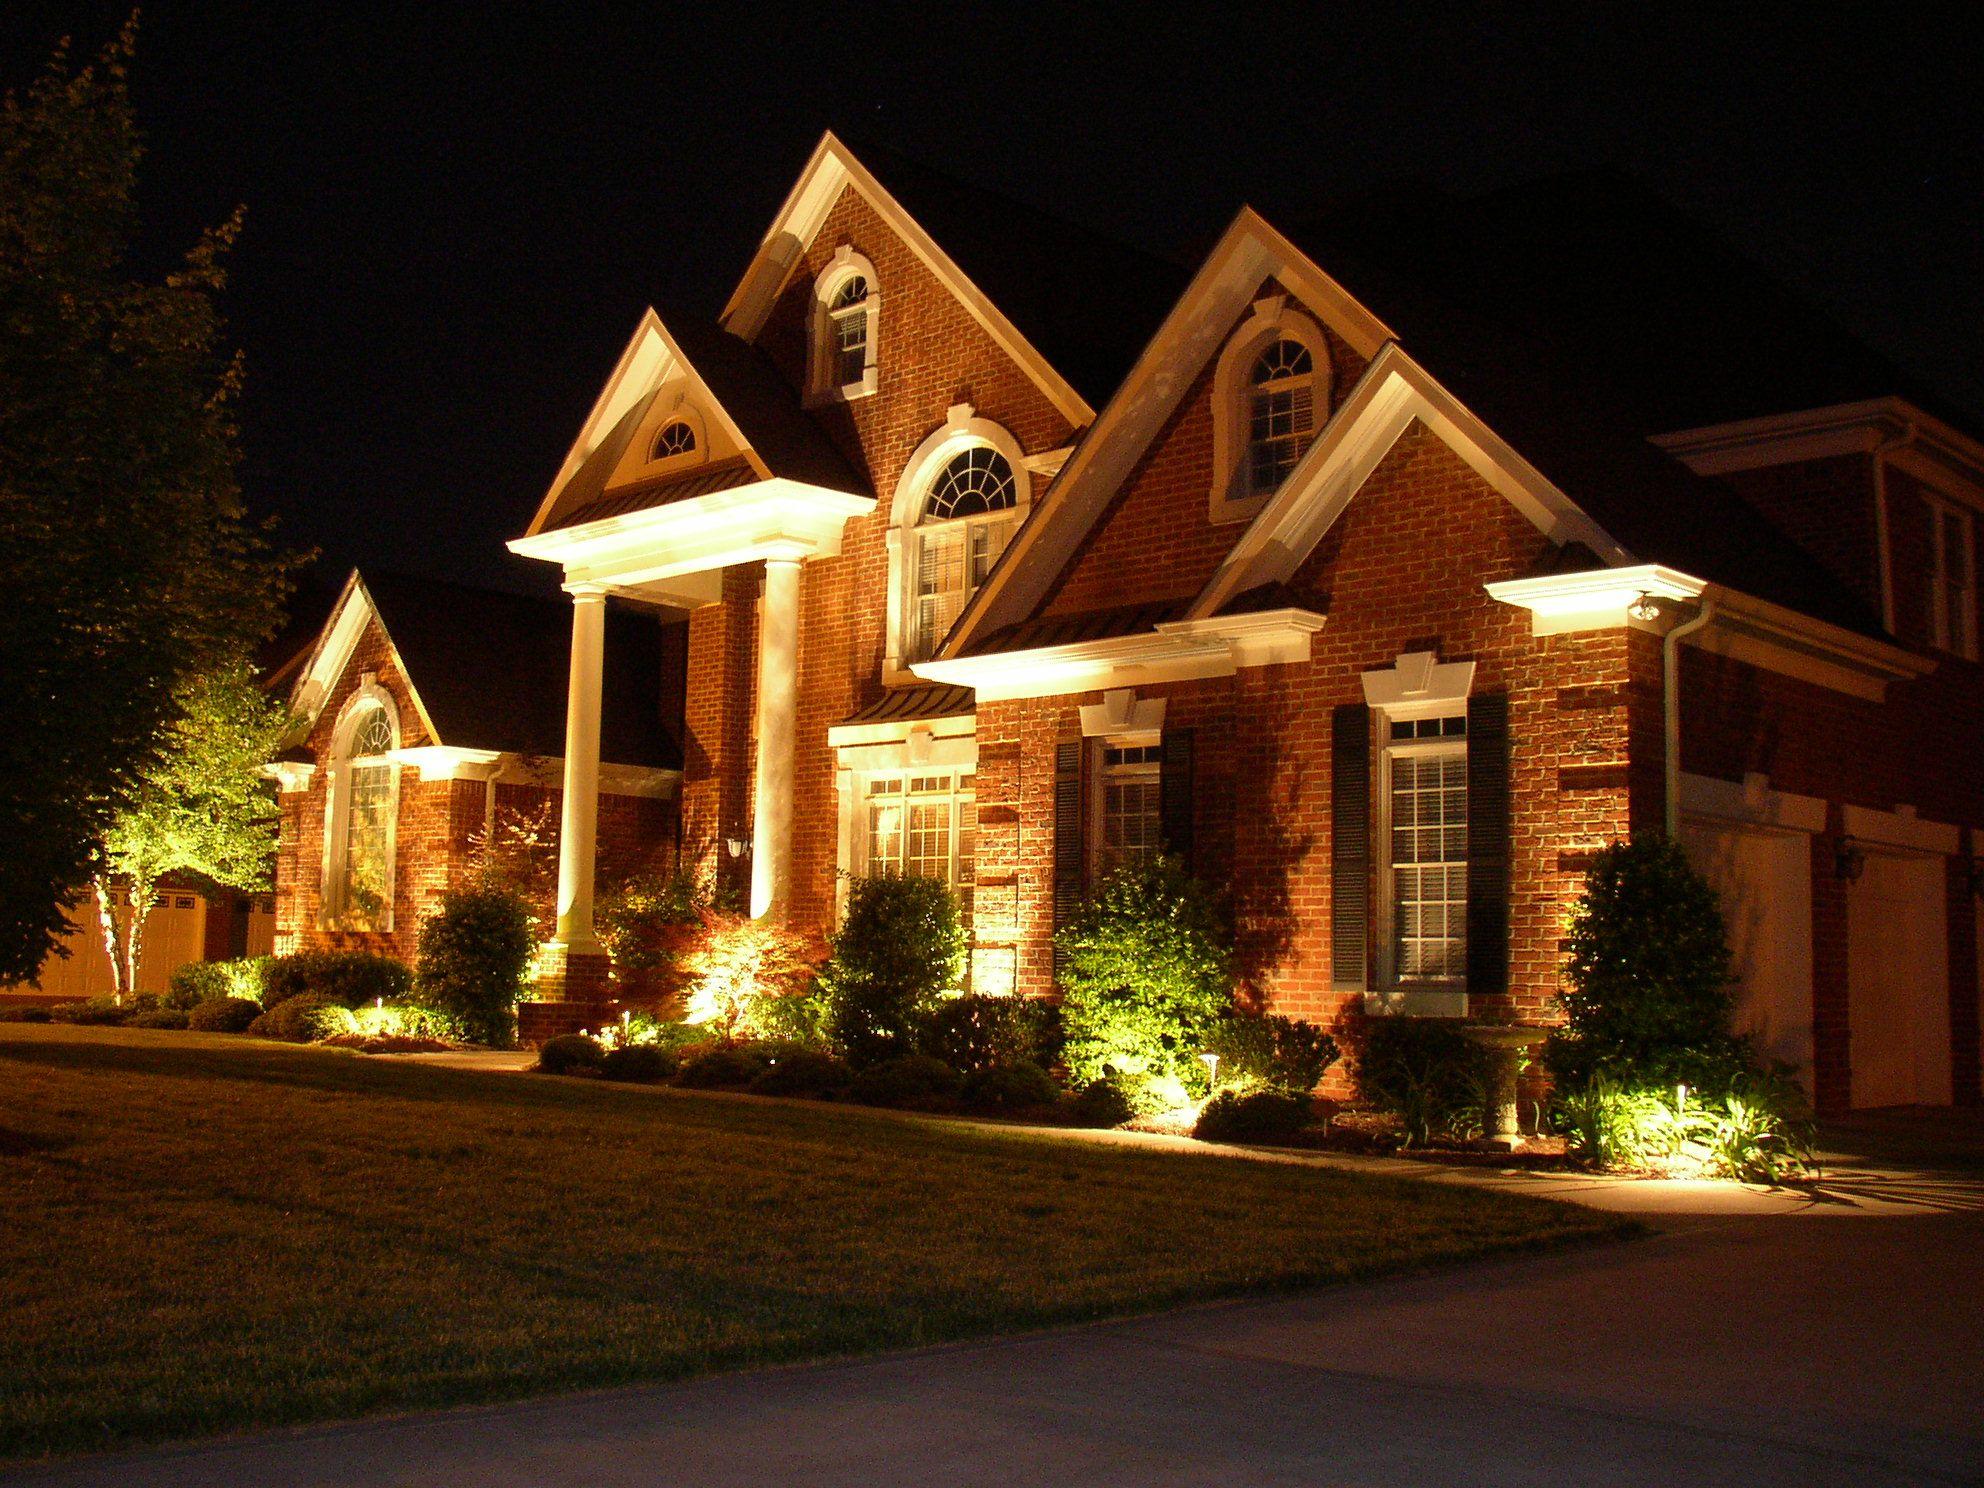 images home lighting designs patiofurn. Lighting | Outdoor Tampa Nighttime Design Houses Pinterest Lighting, External And Lights Images Home Designs Patiofurn